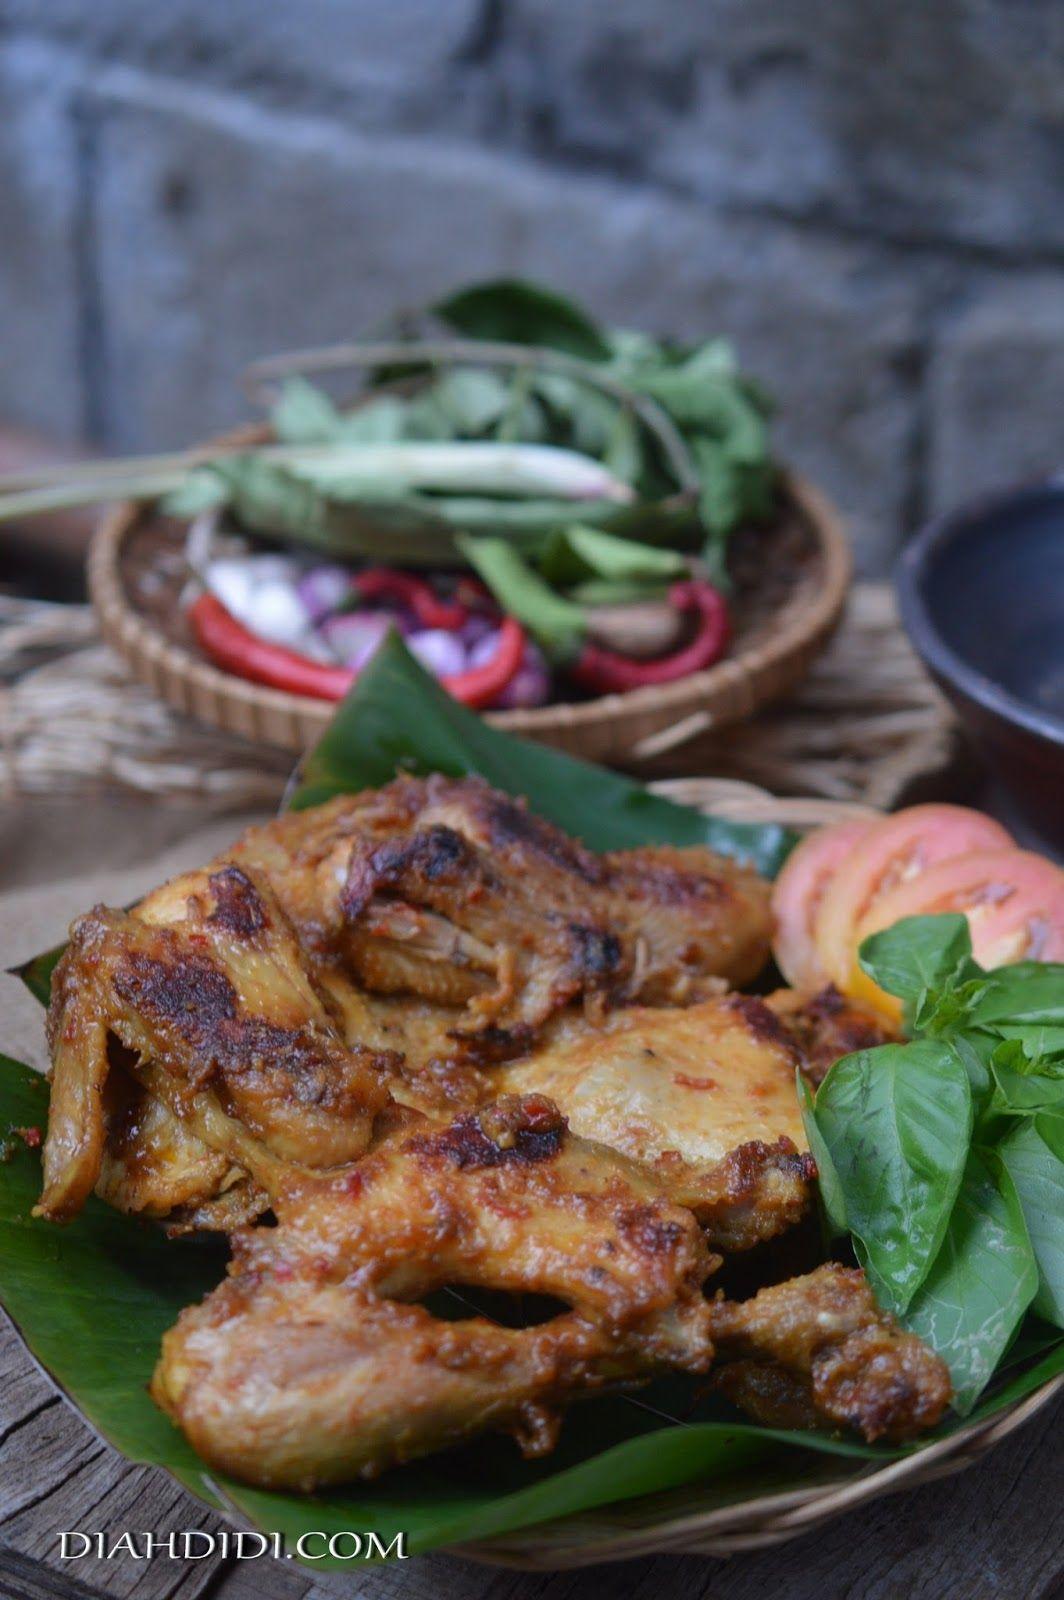 Blog Diah Didi Berisi Resep Masakan Praktis Yang Mudah Dipraktekkan Di Rumah Resep Masakan Resep Ayam Resep Masakan Malaysia